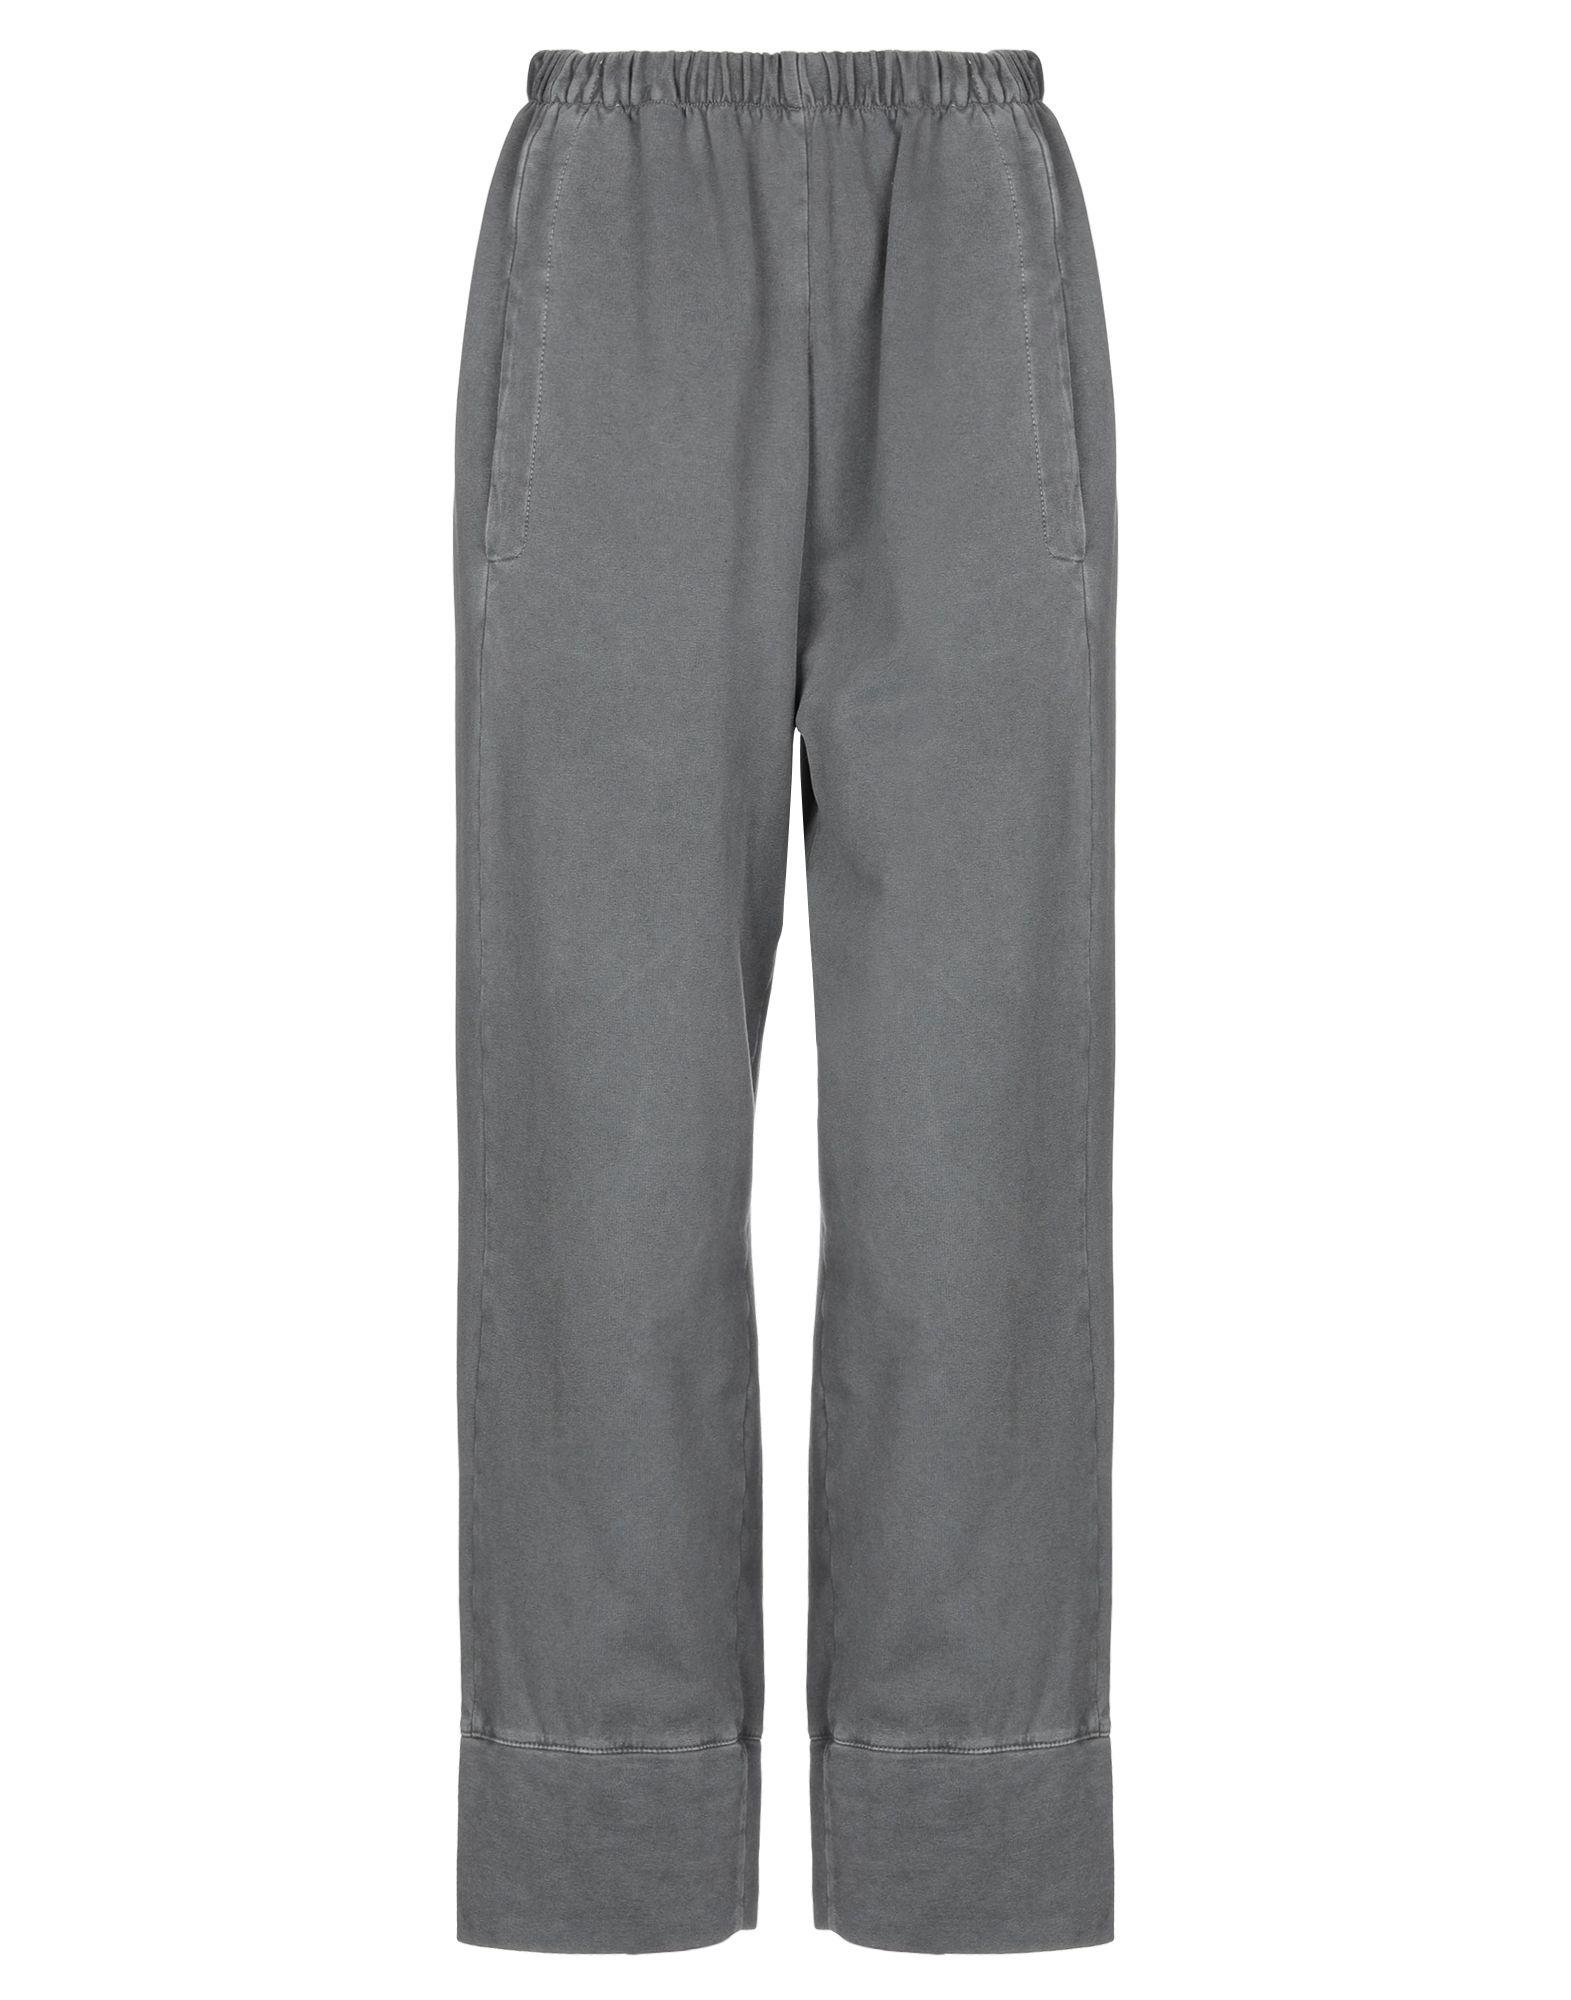 DARK CODE Повседневные брюки dark code бермуды